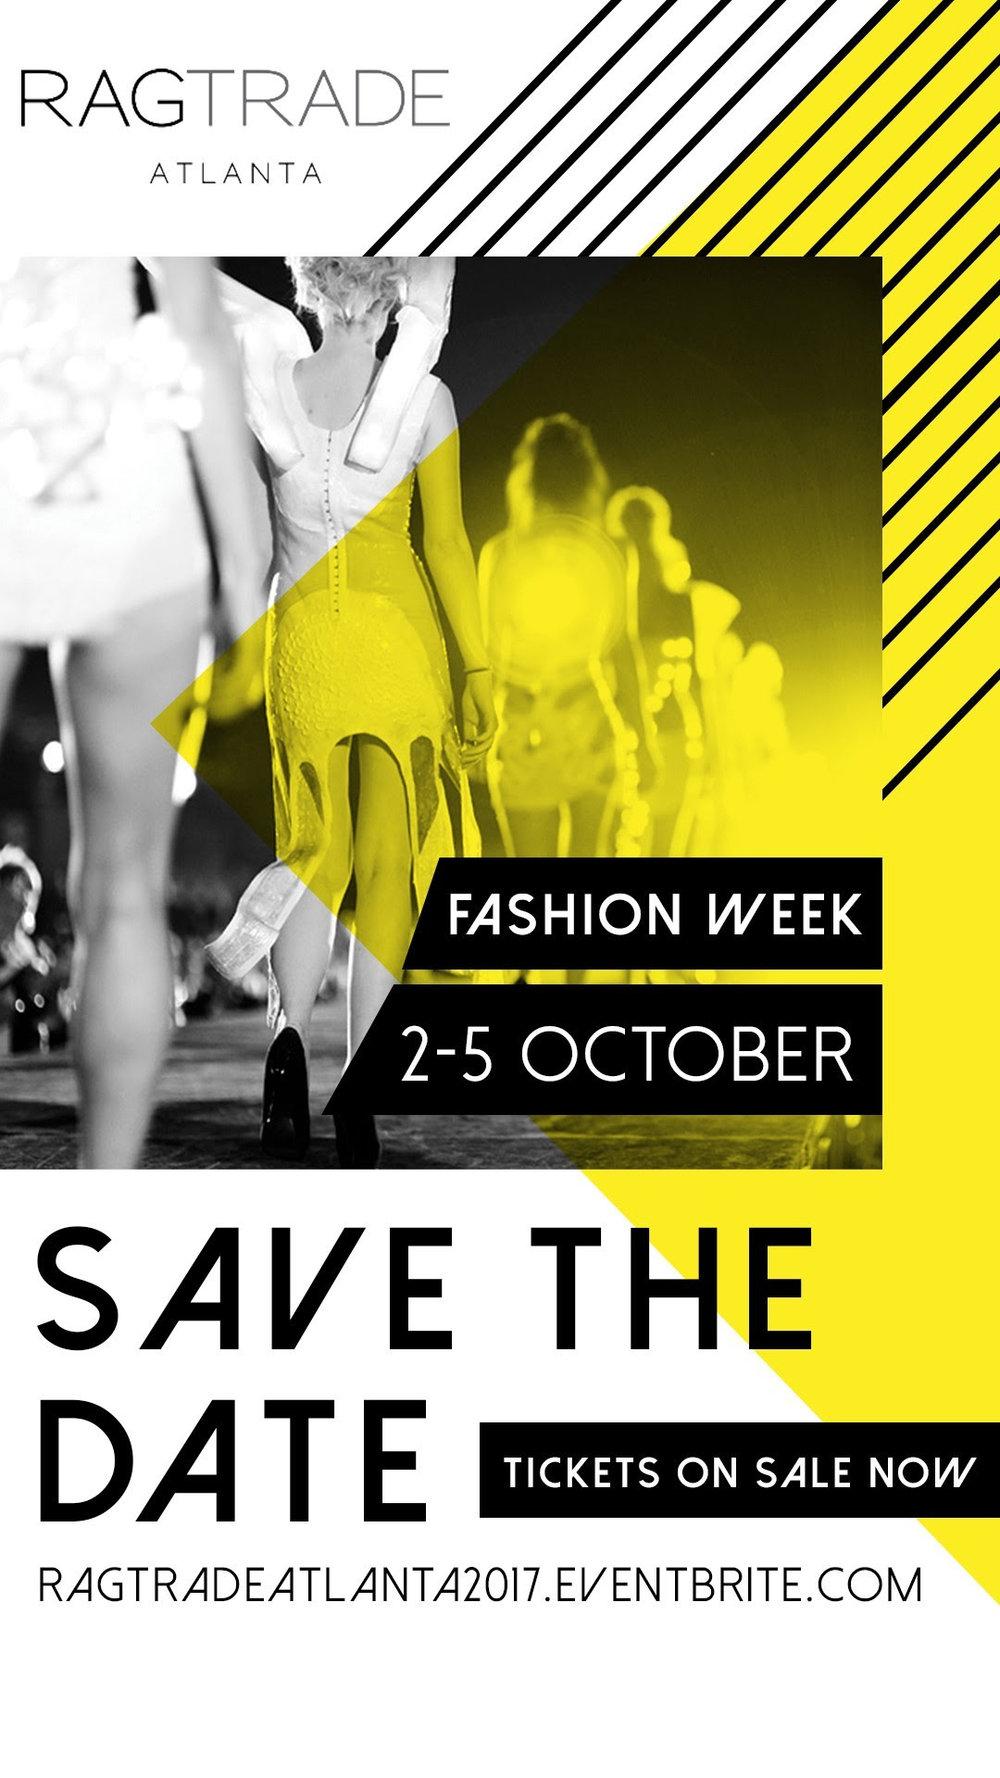 ragtrade atlanta fashion week